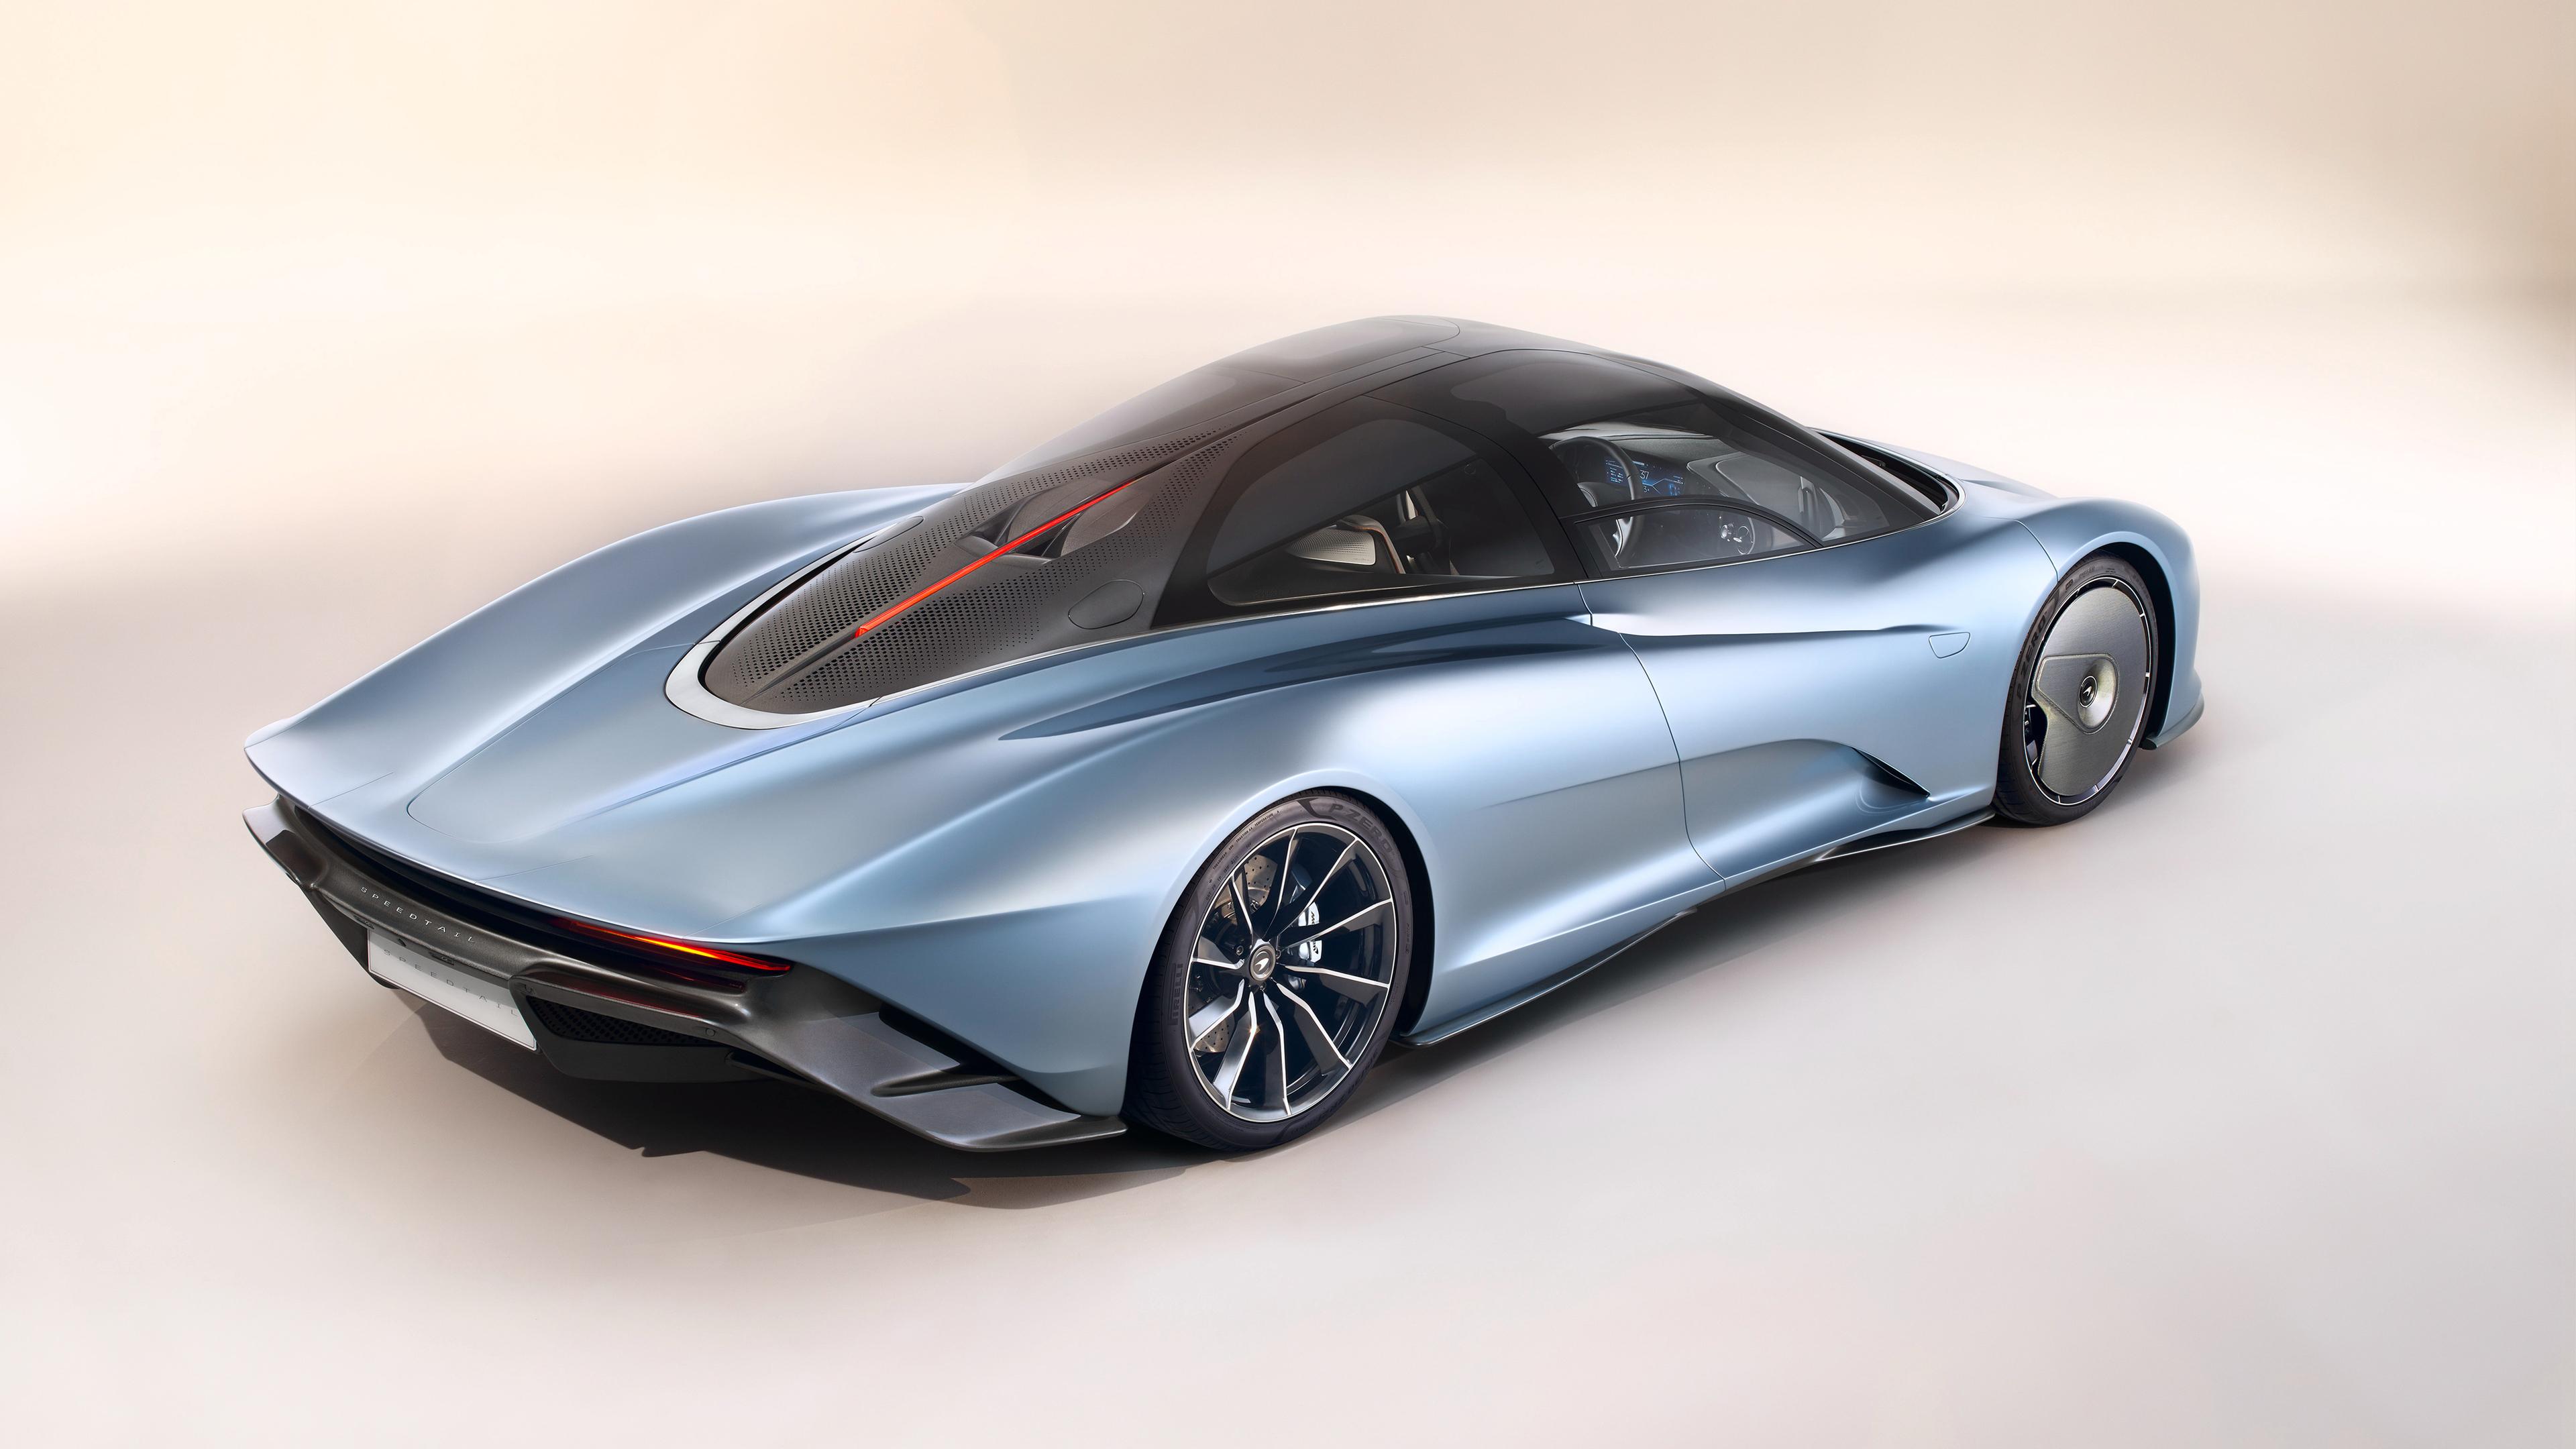 mclaren speedtail 2018 rear 4k 1541969020 - McLaren Speedtail 2018 Rear 4k - mclaren speedtail wallpapers, hd-wallpapers, cars wallpapers, 4k-wallpapers, 2018 cars wallpapers